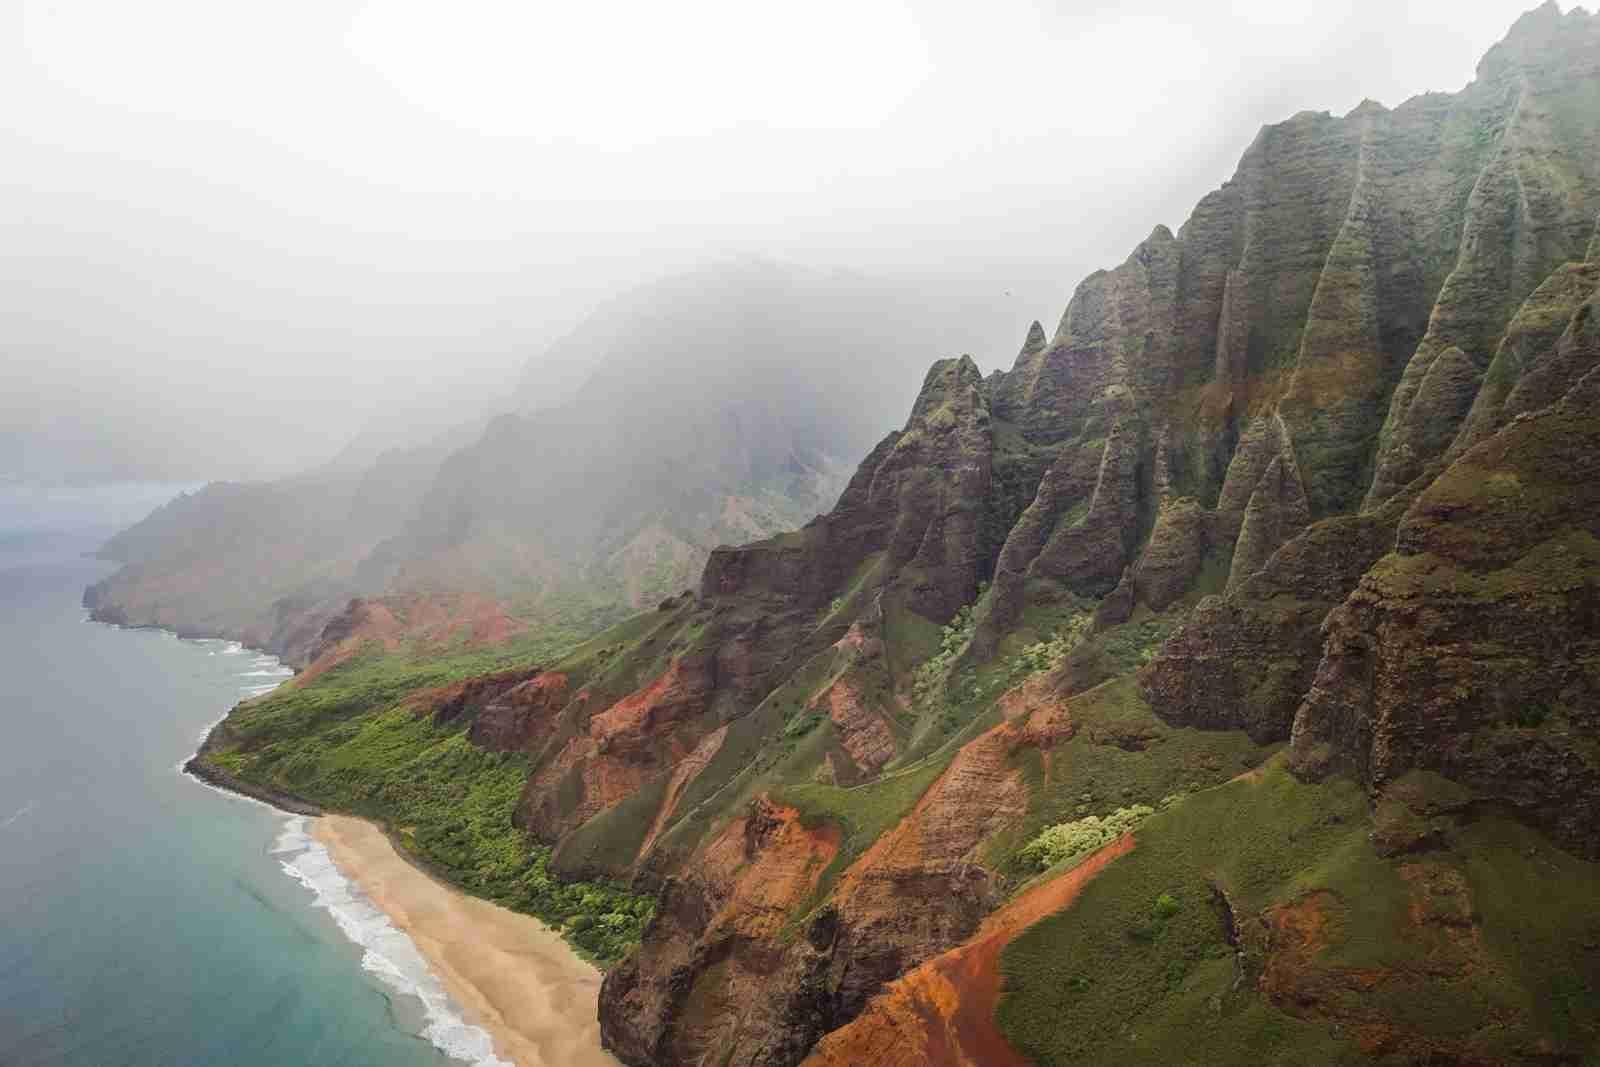 A coastal area of Hawaii. (Photo by Casey Allen/Unsplash)